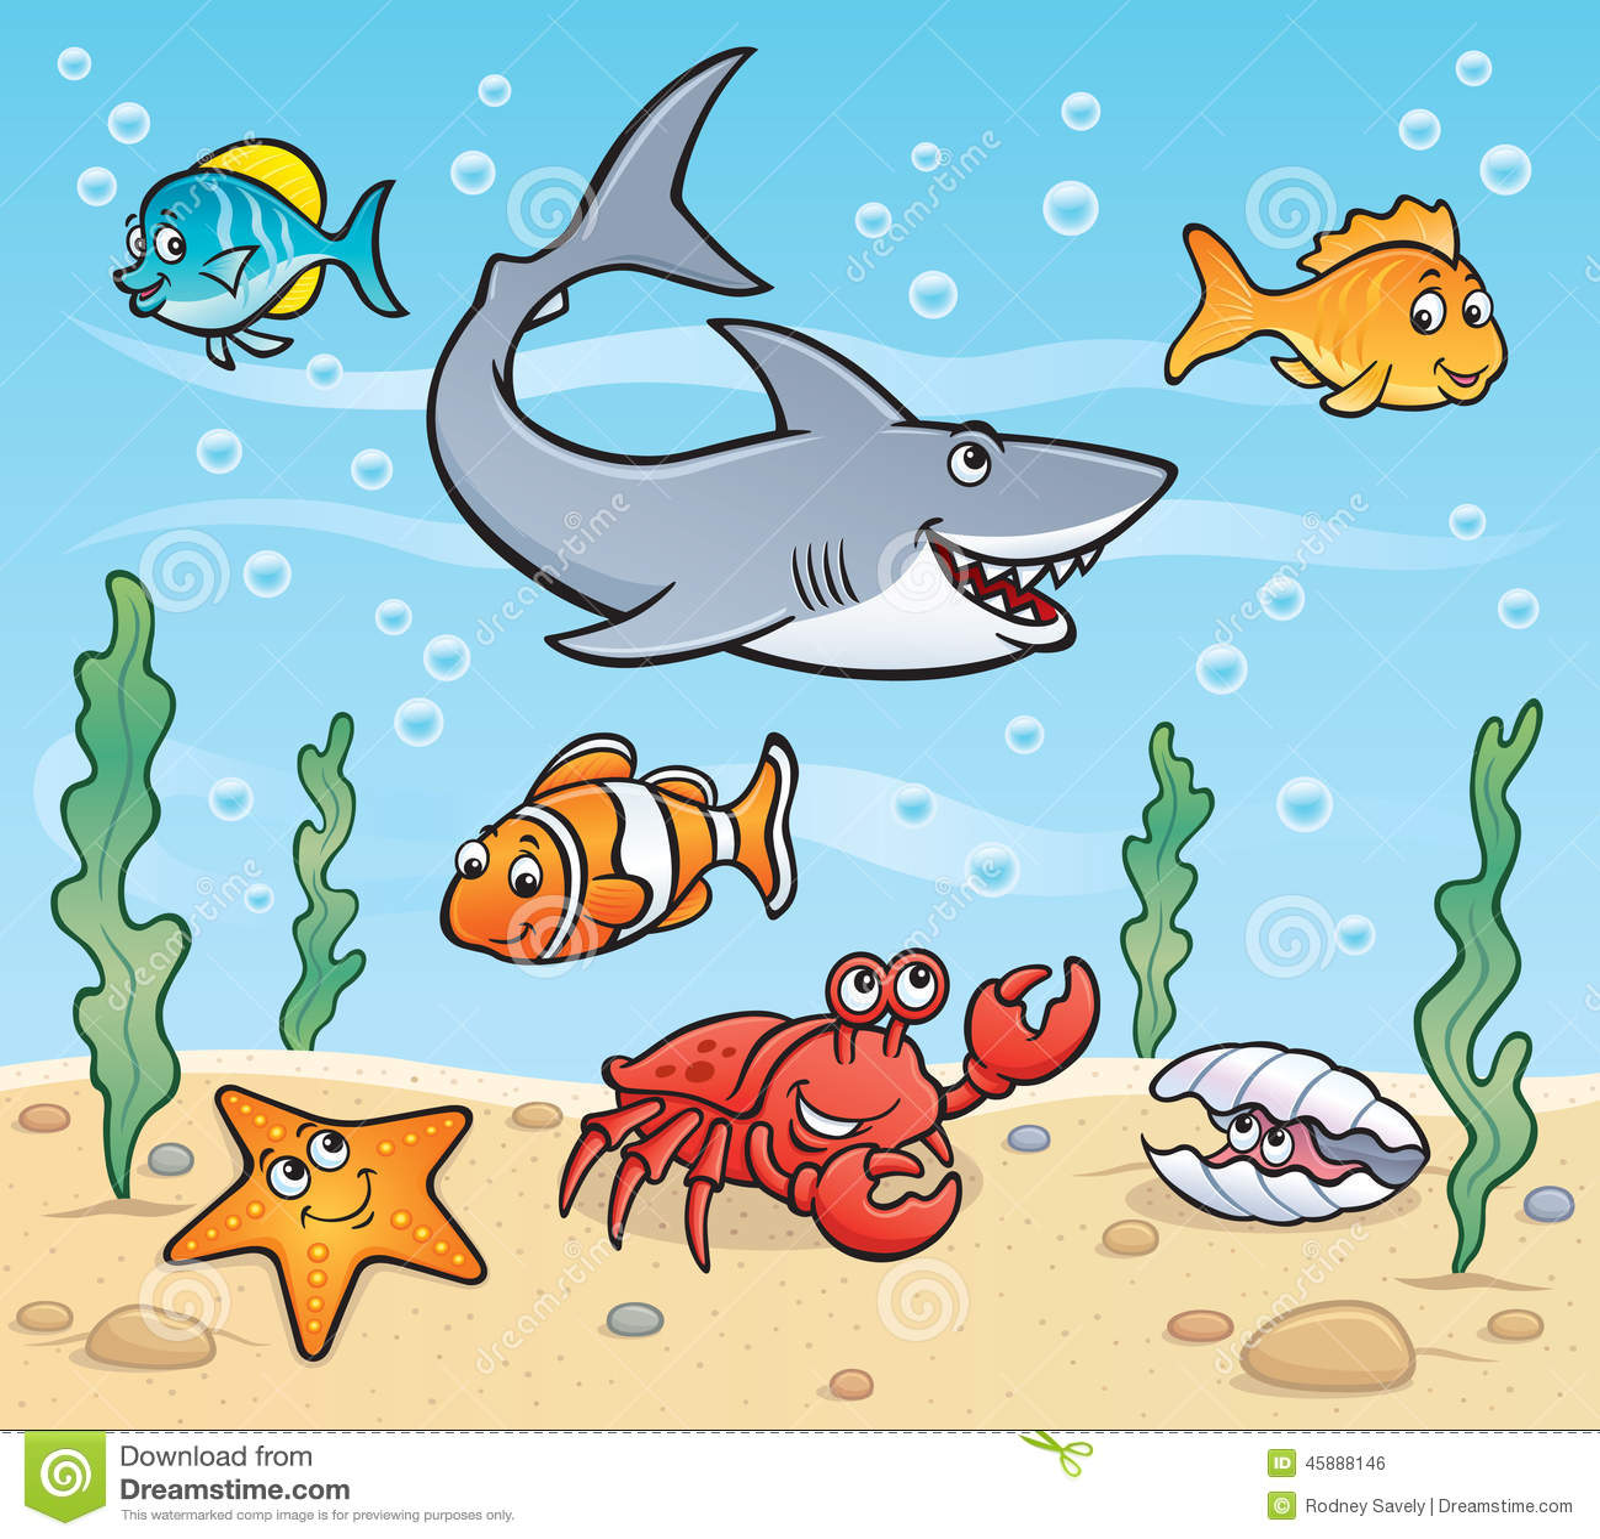 sea life scene stock illustration image 45888146 Seahorse Clip Art clown fish pictures clip art